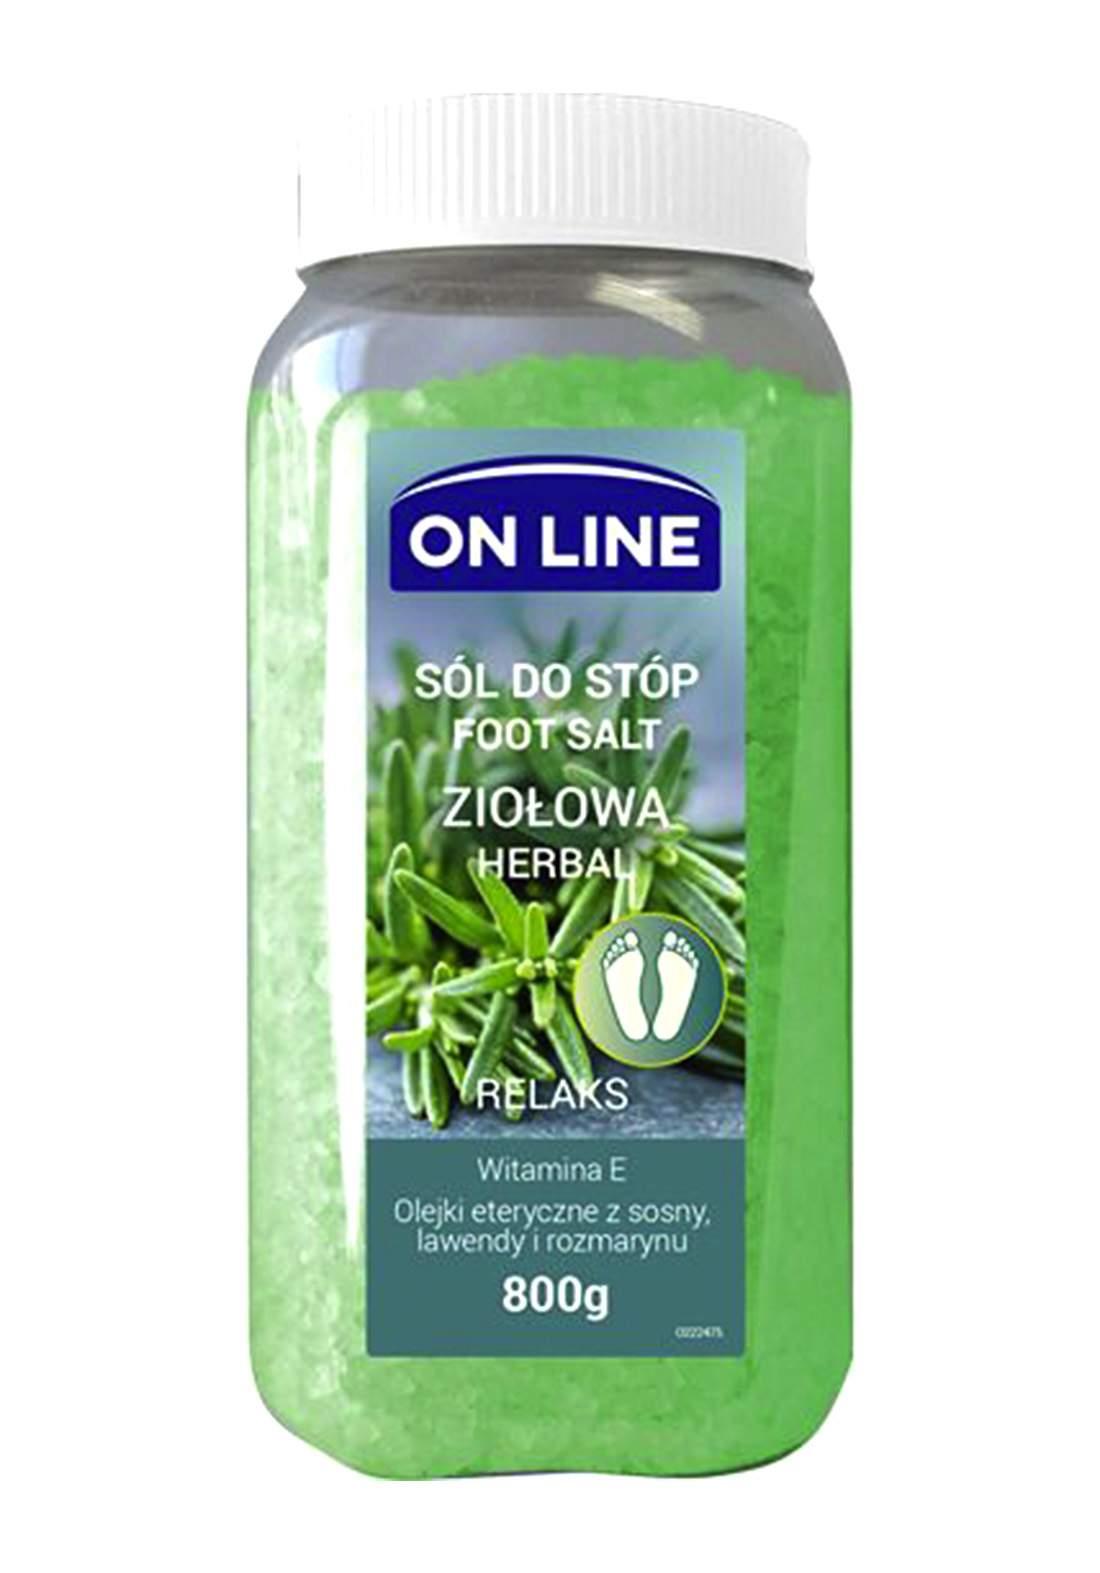 Online Herbal bath salts 800g املاح العناية بالقدم